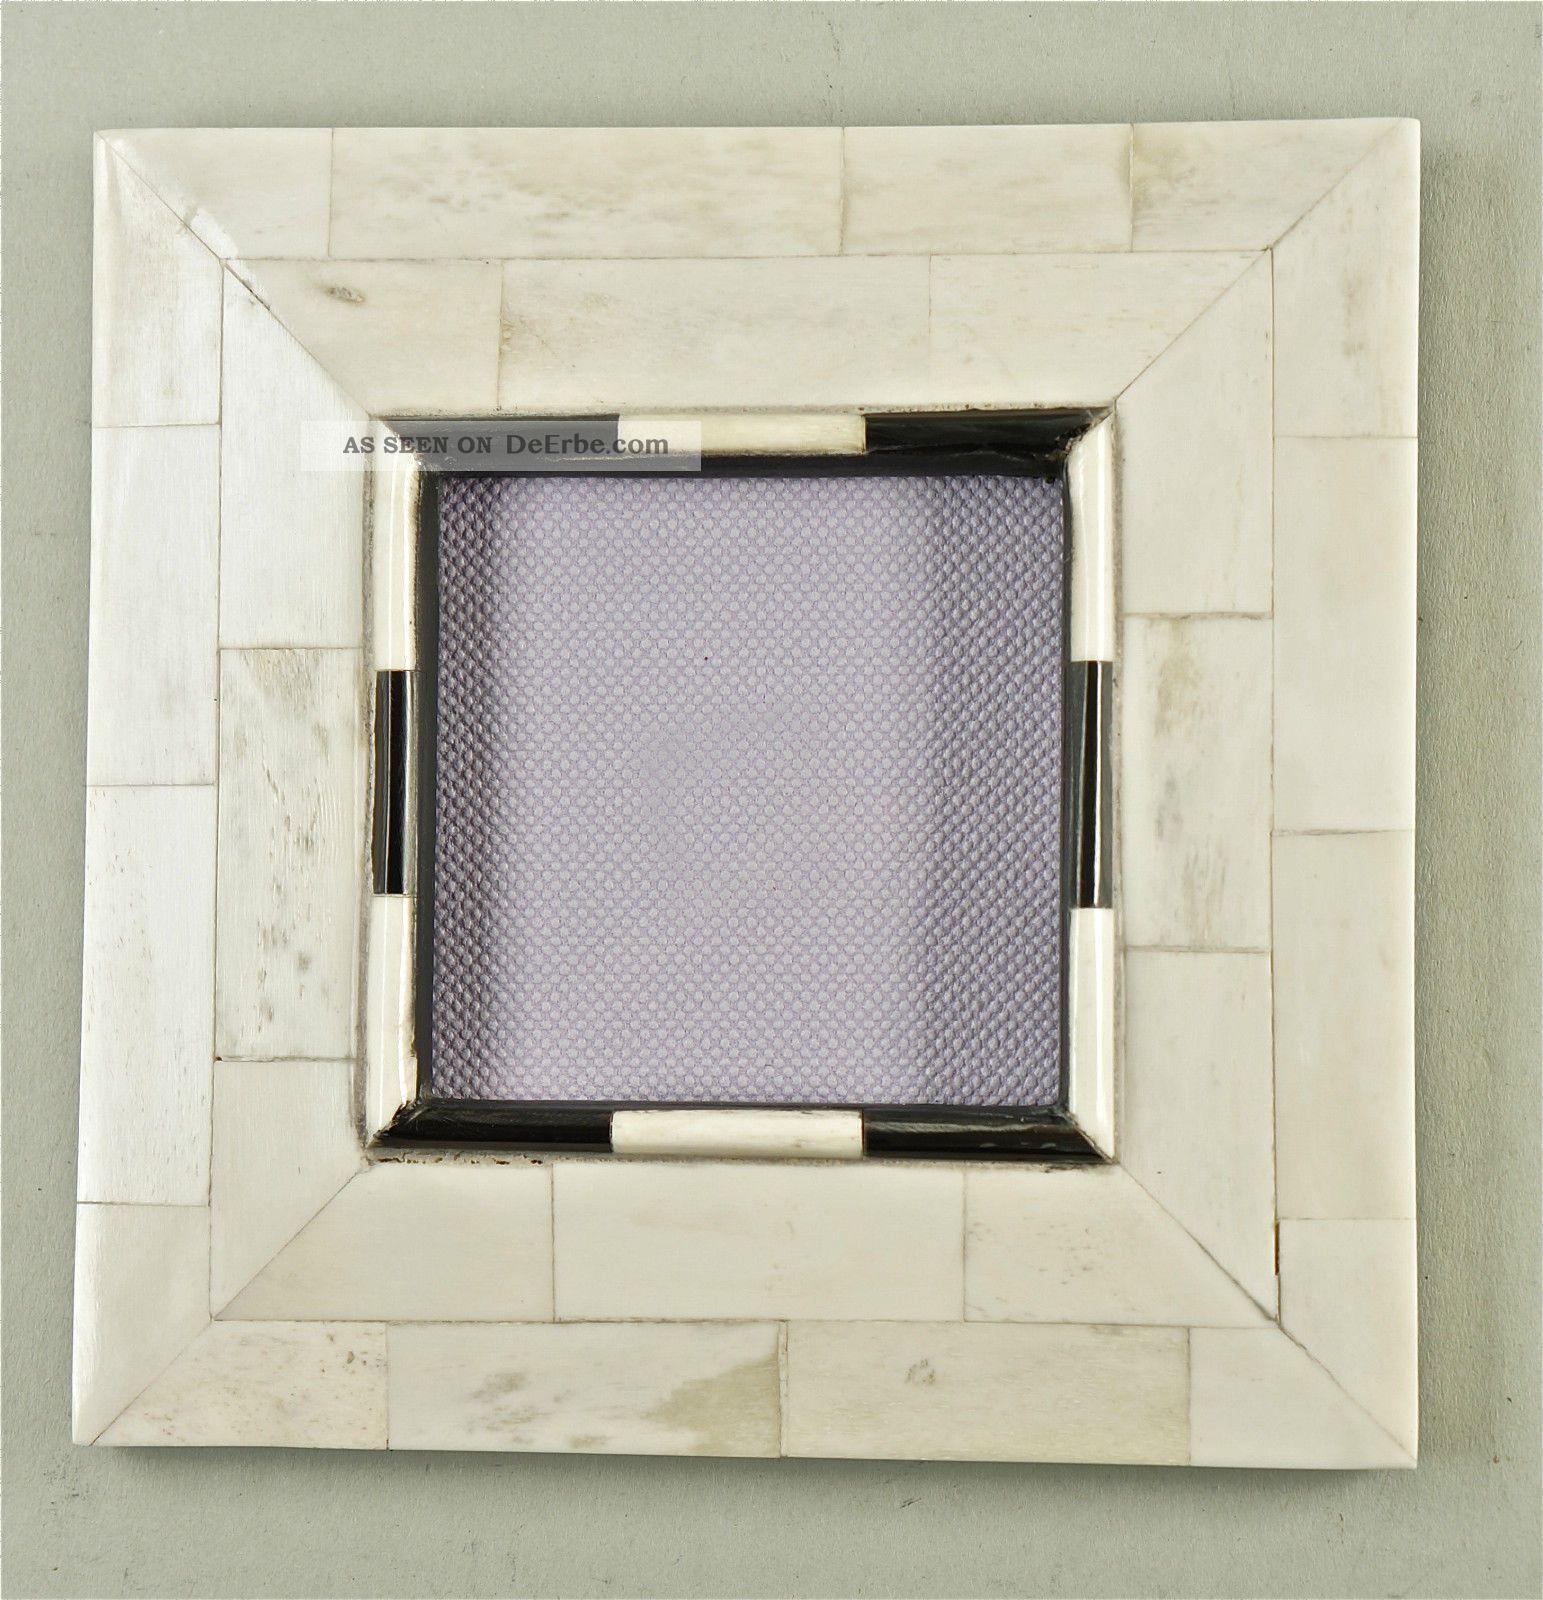 glas auf holz kleben gfk kleben anleitung in 5 schritten glas auf holz kleben google groups. Black Bedroom Furniture Sets. Home Design Ideas